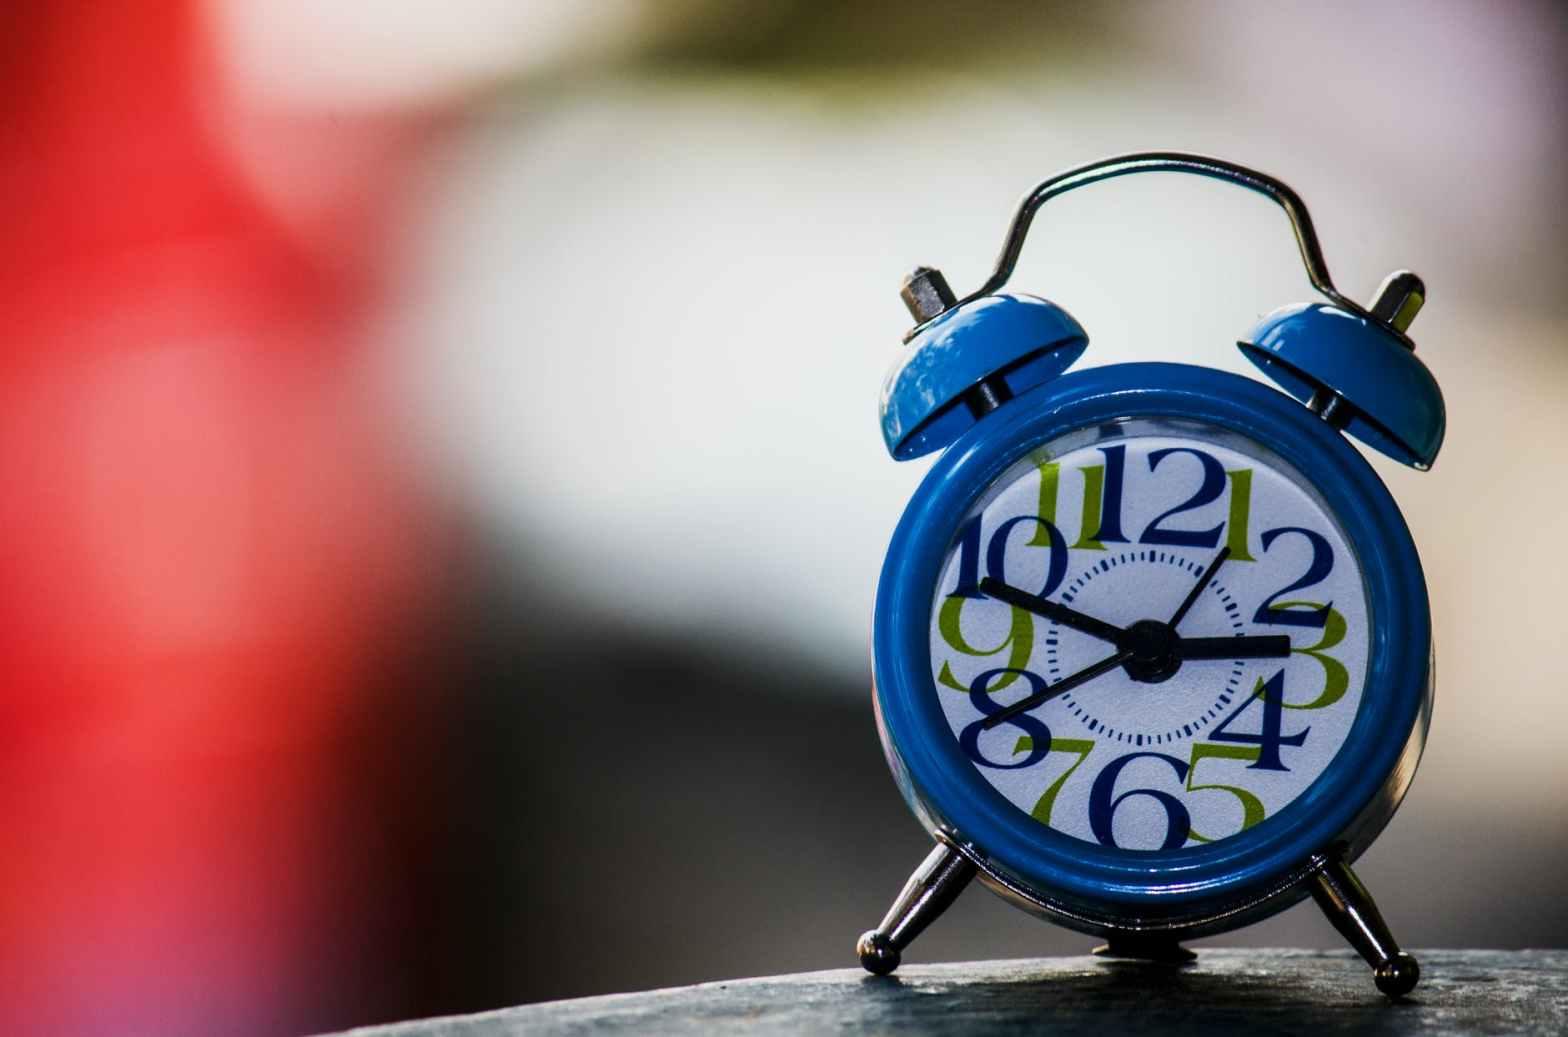 blue and white alarm clock